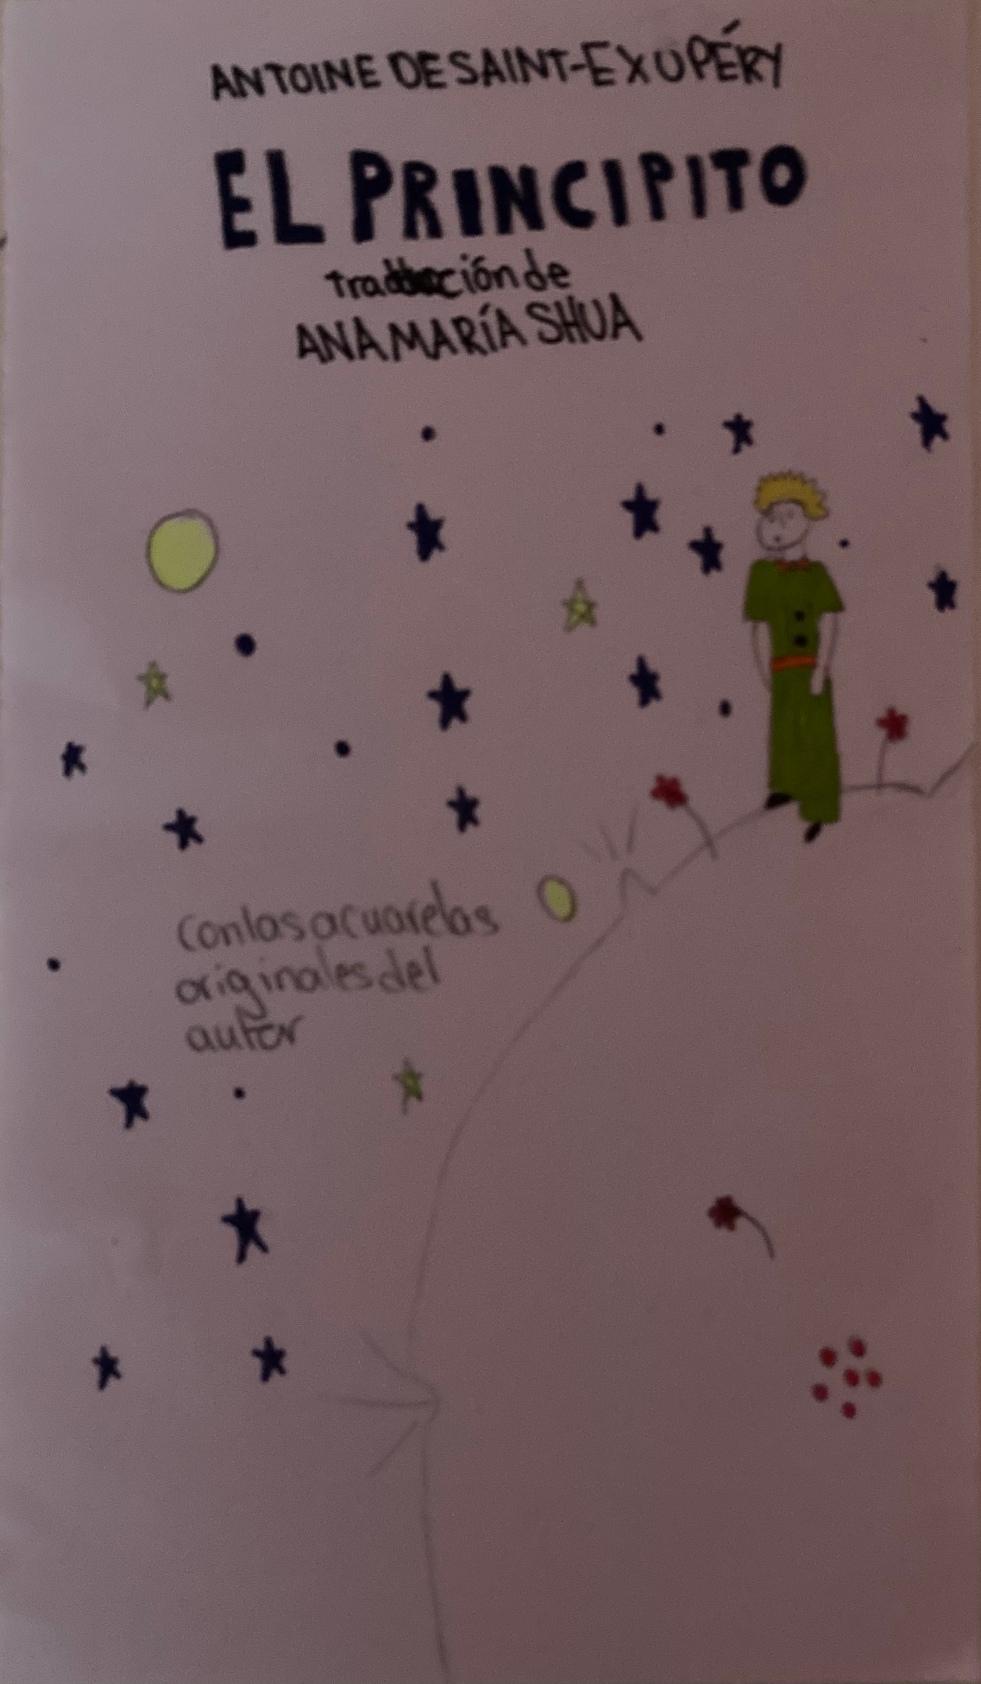 A hand drawn cover of El Principito